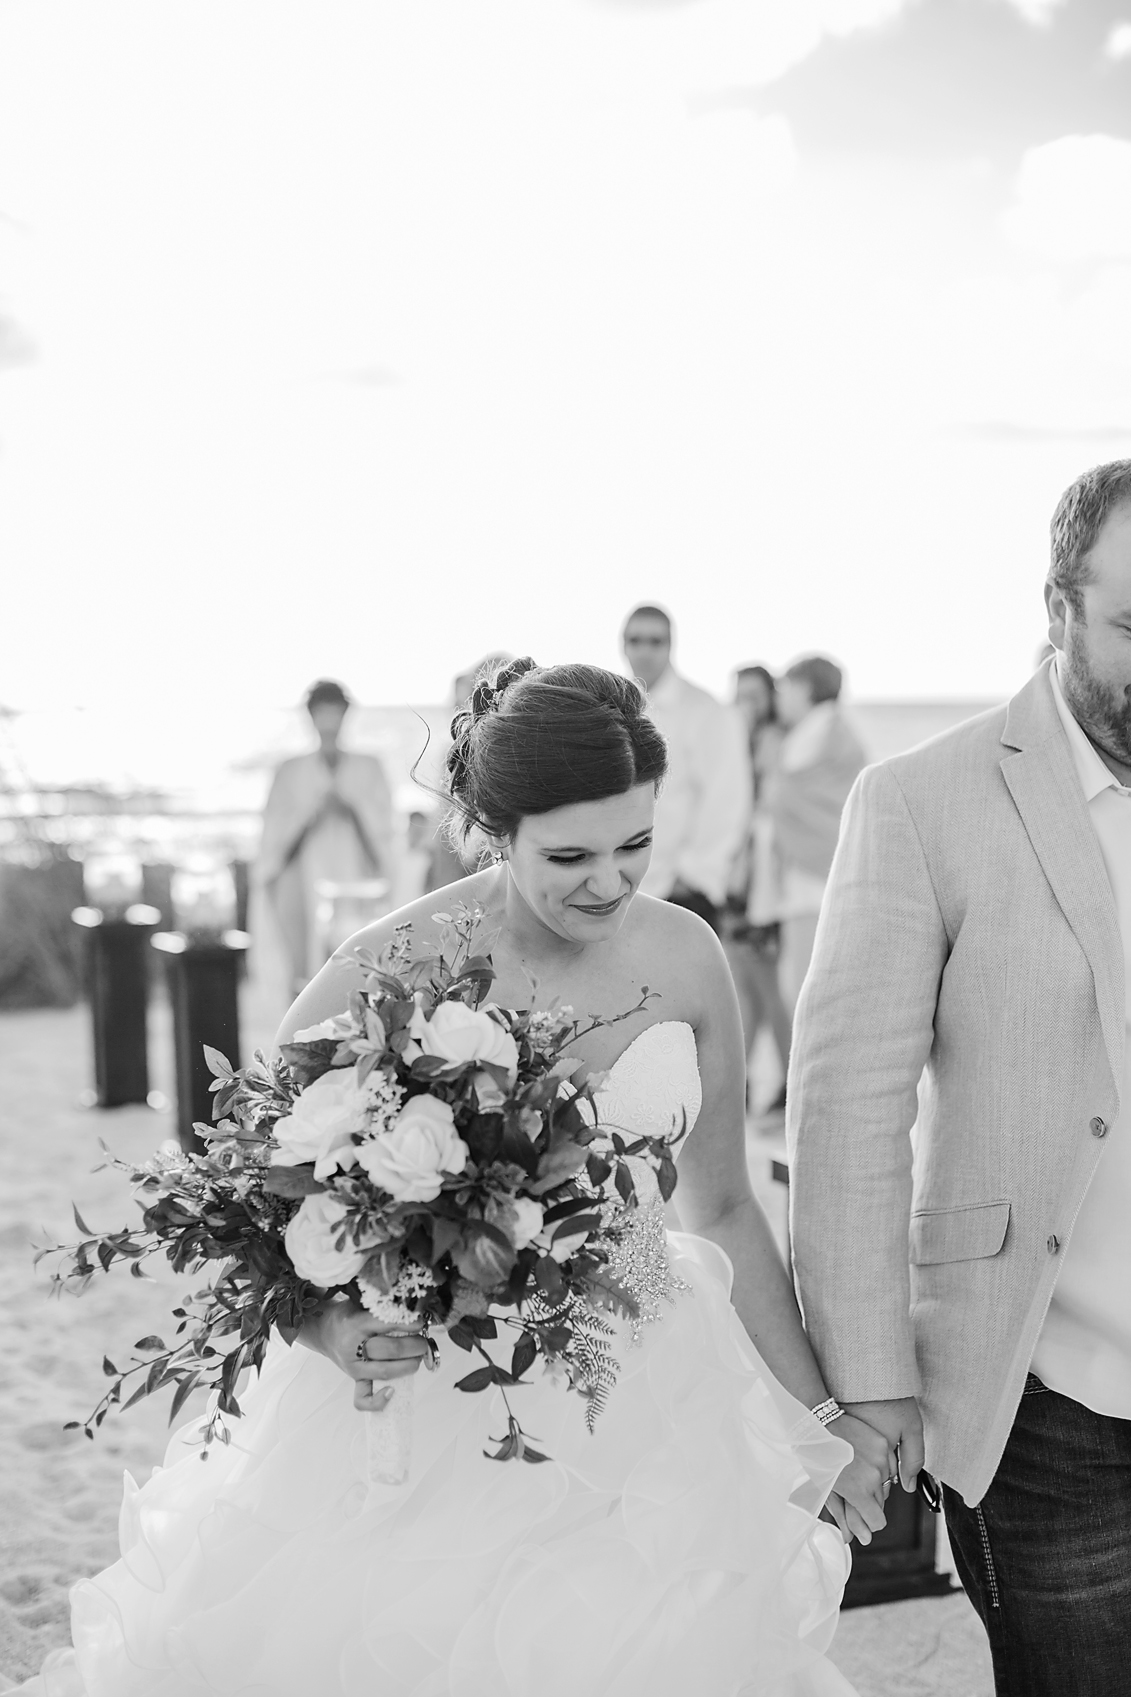 Bailey + Chalin - Anna Maria Island Wedding Photographer - Destination Wedding Photography - Emily & Co. Photography - Beach Wedding Photography (27).jpg